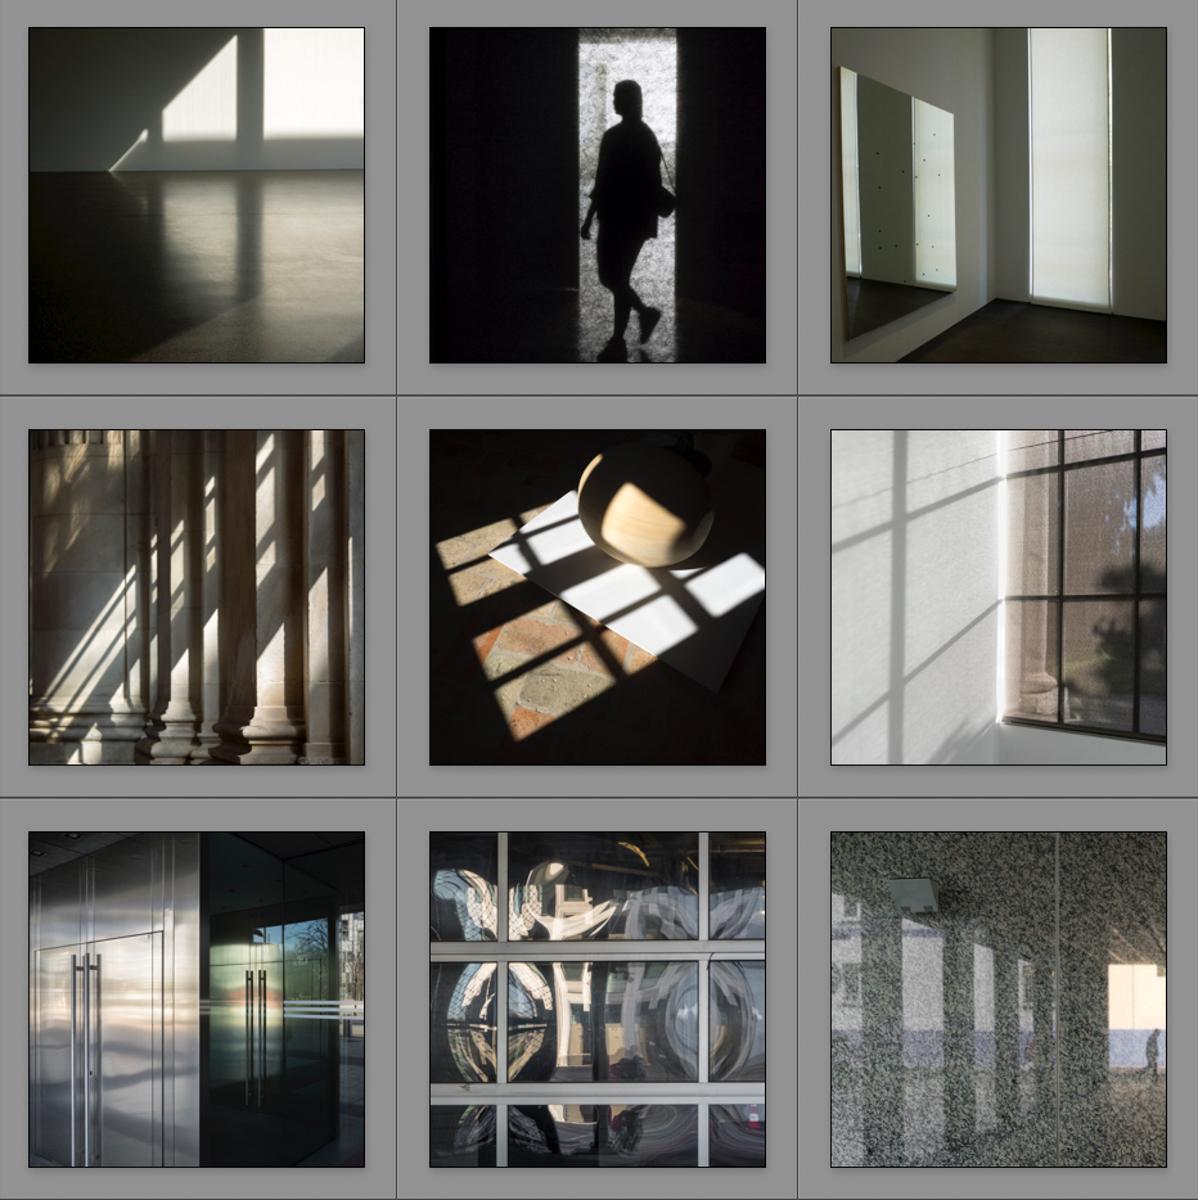 Políptico 1 Fijando sombras - Mirrors and Windows - Mirrors and Windows 2018